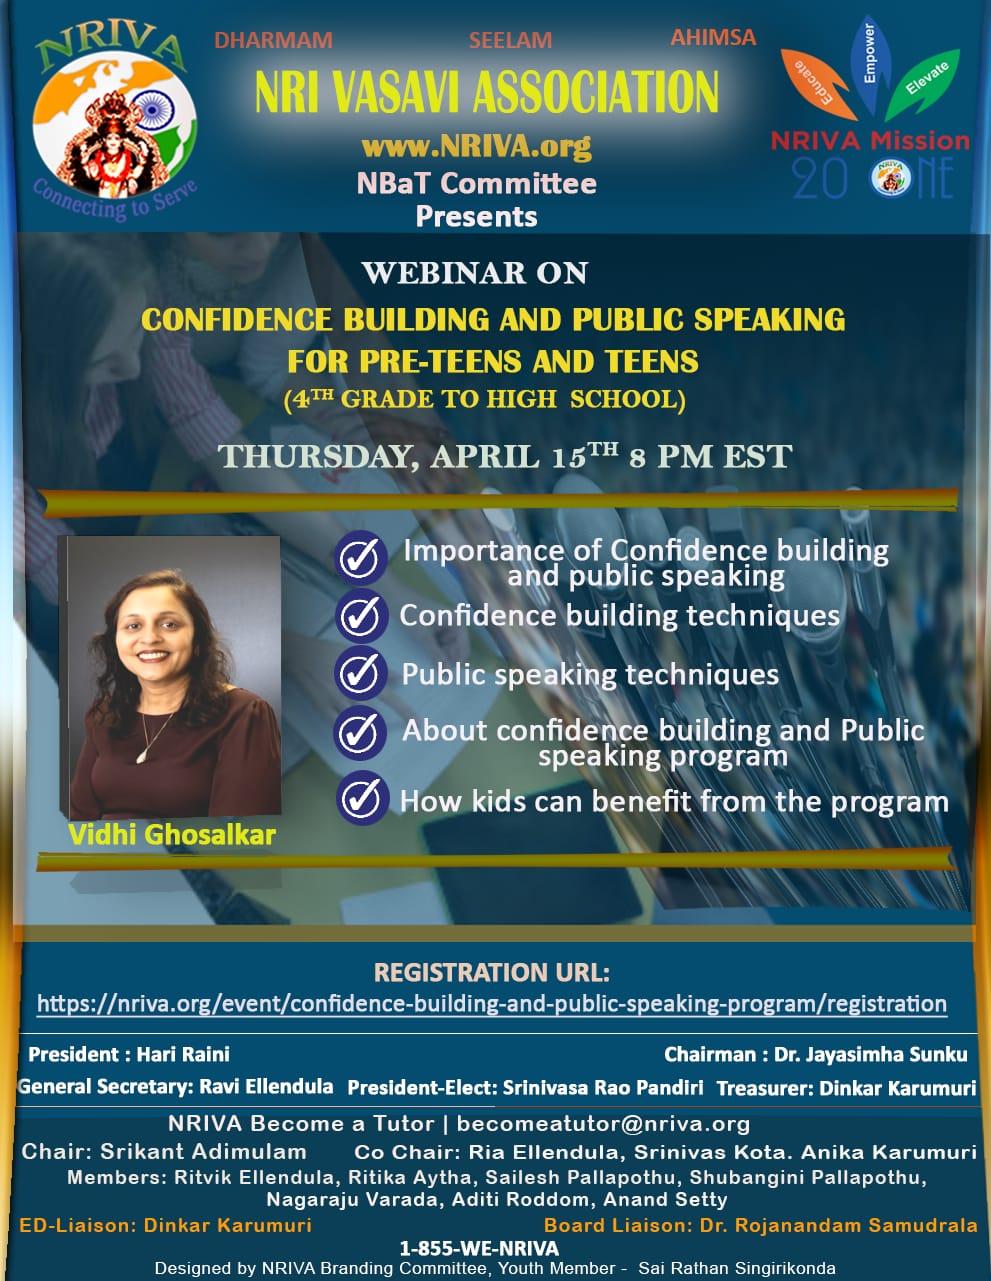 Confidence Building and Public Speaking Program